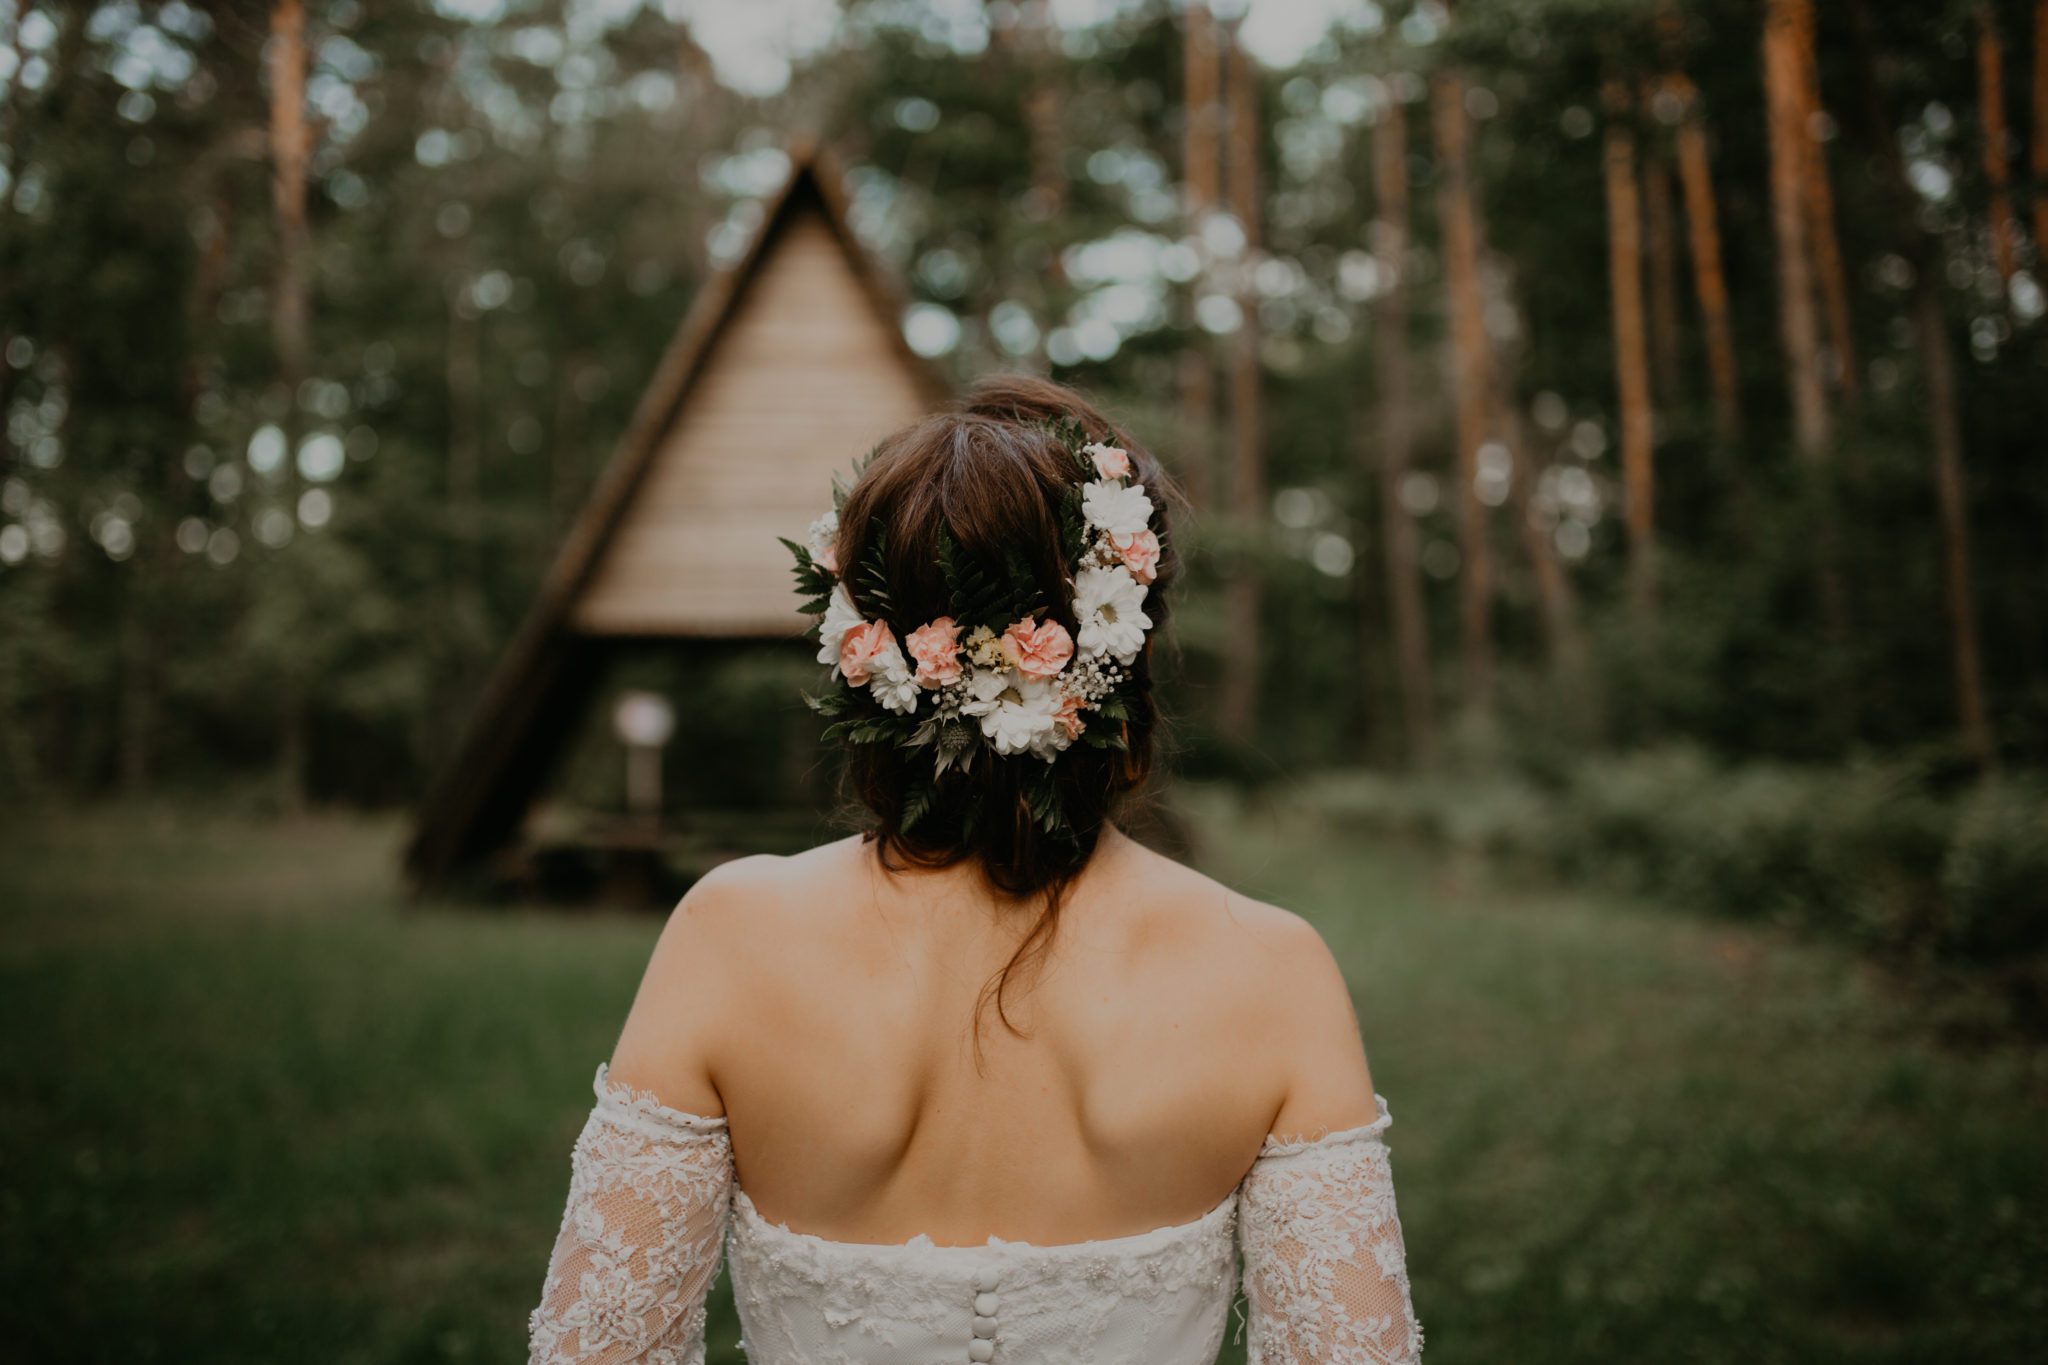 gosia i kubaplener 13 1 - fotografiagk Fotografia ślubna RK wedding